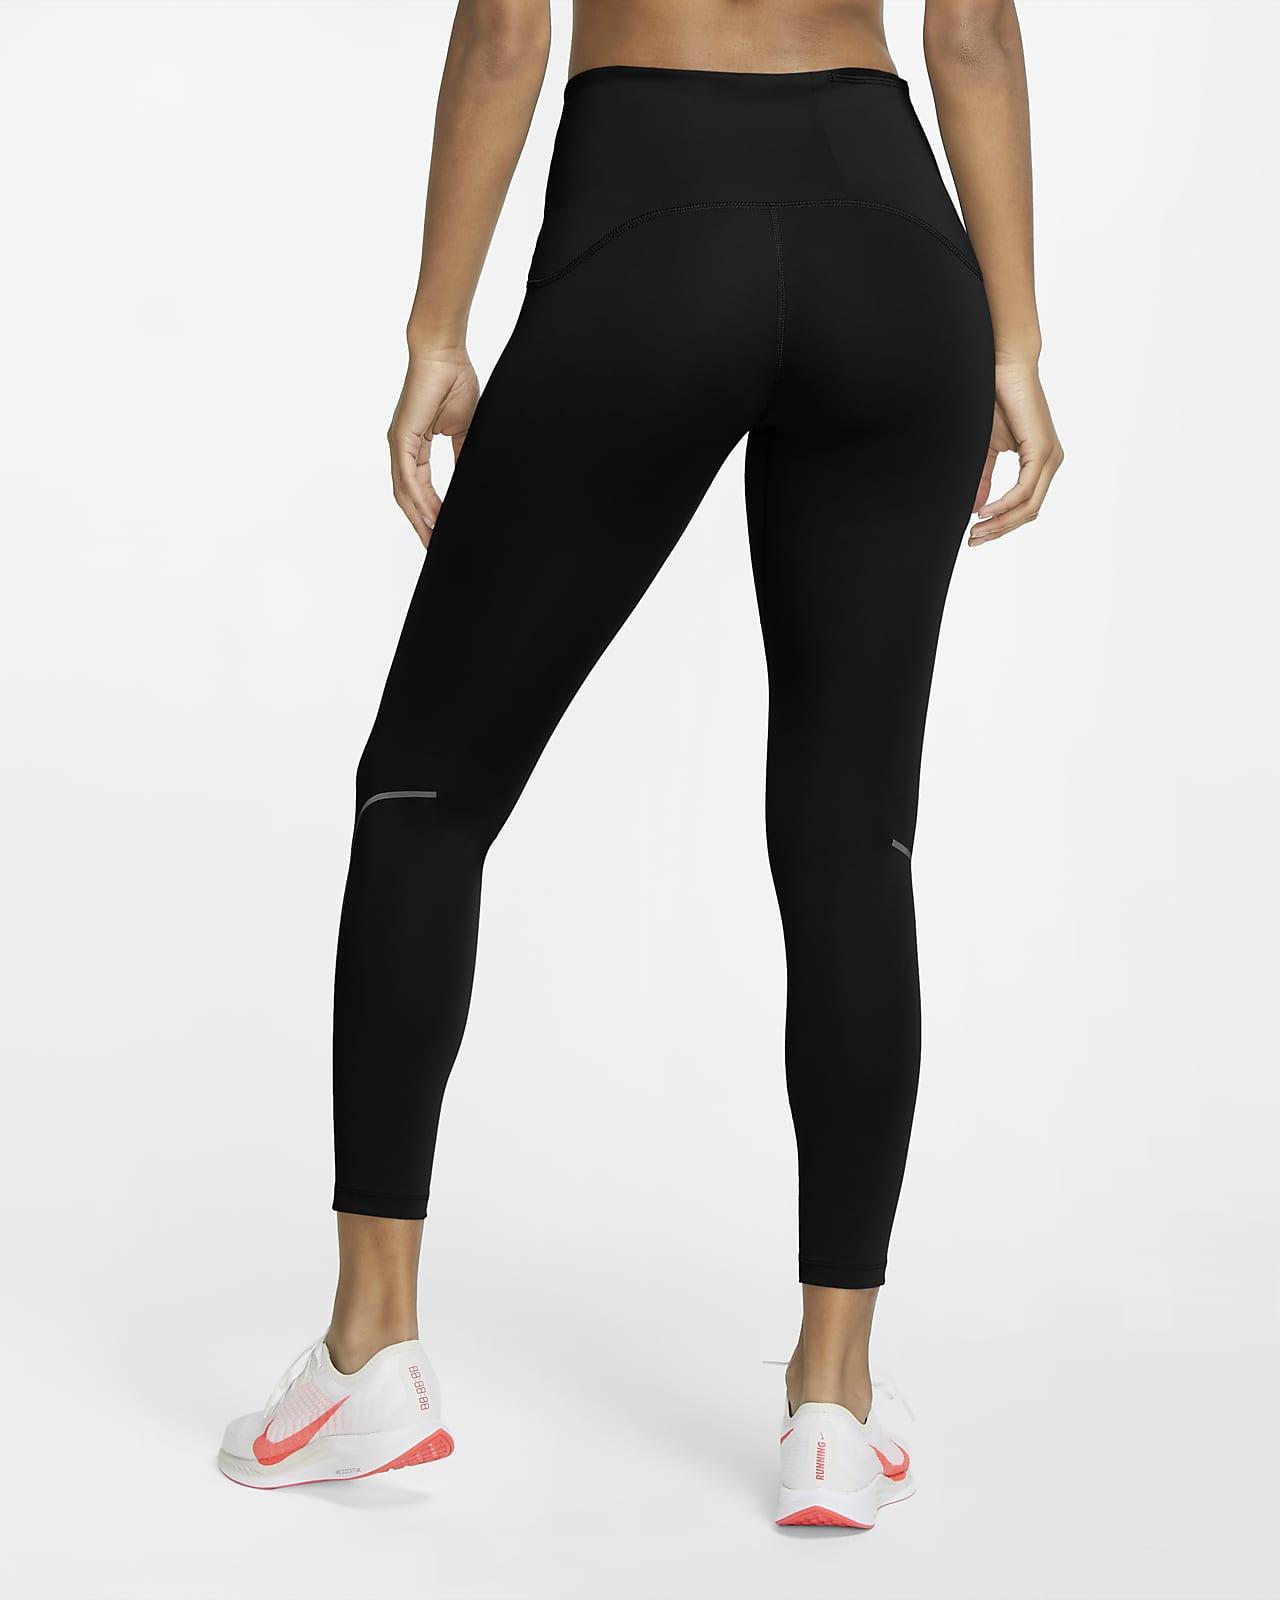 Nike Speed Matte 7/8-hardlooptights voor dames